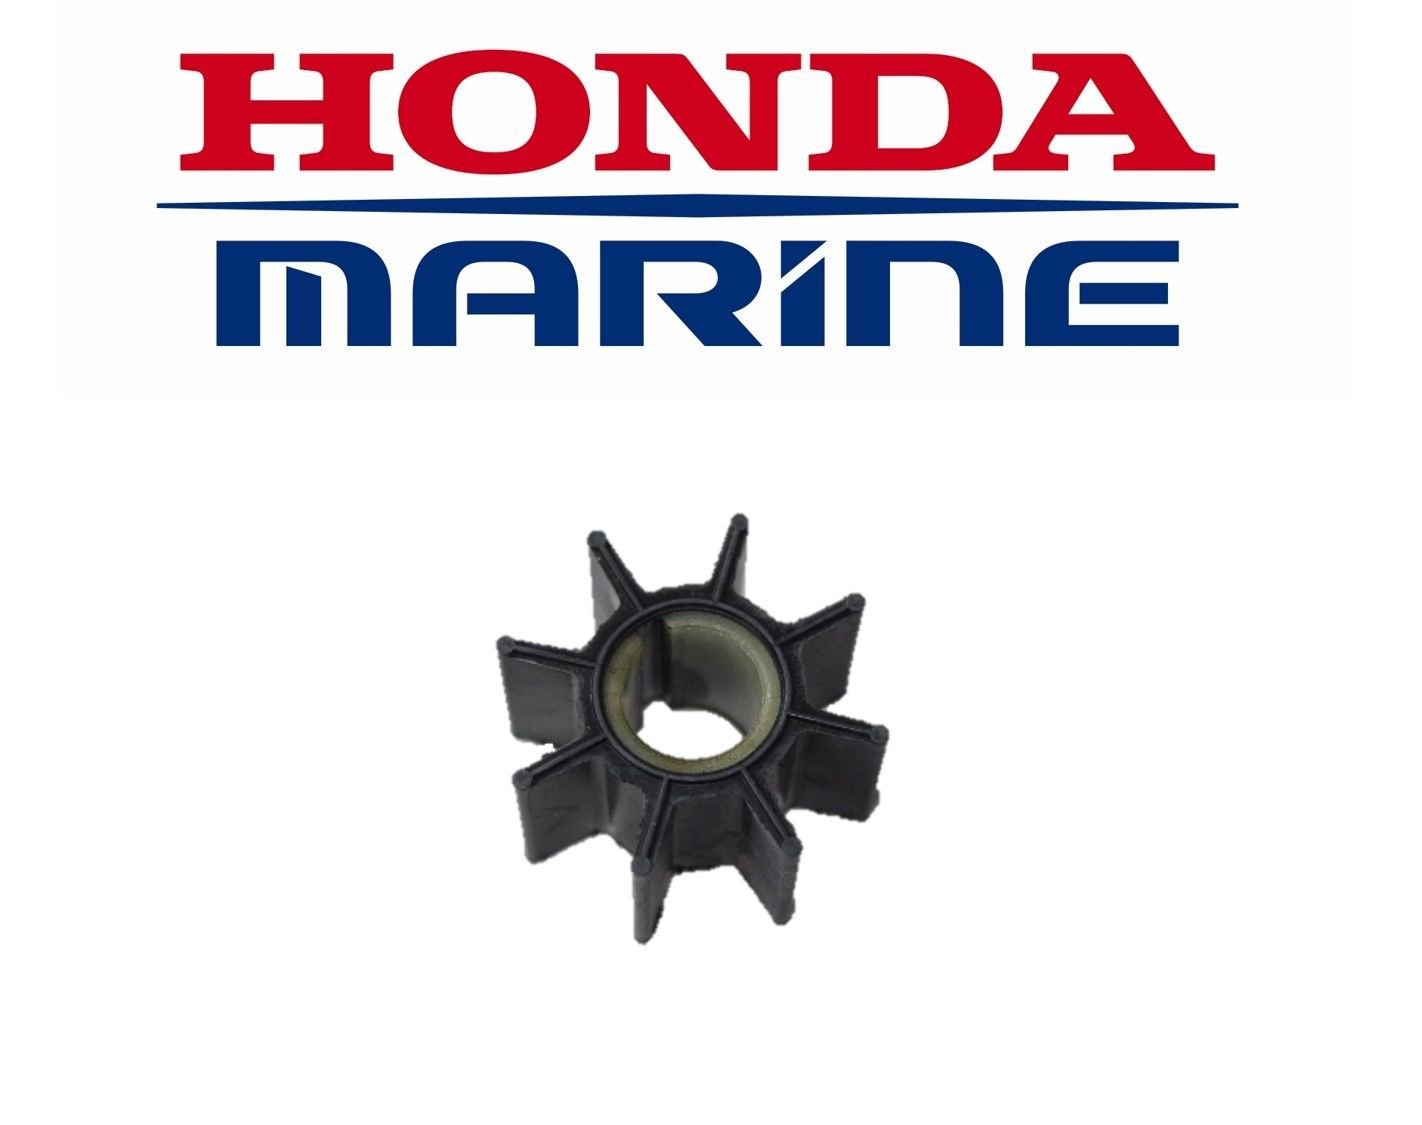 Honda 19210-935-003 Impeller Pump